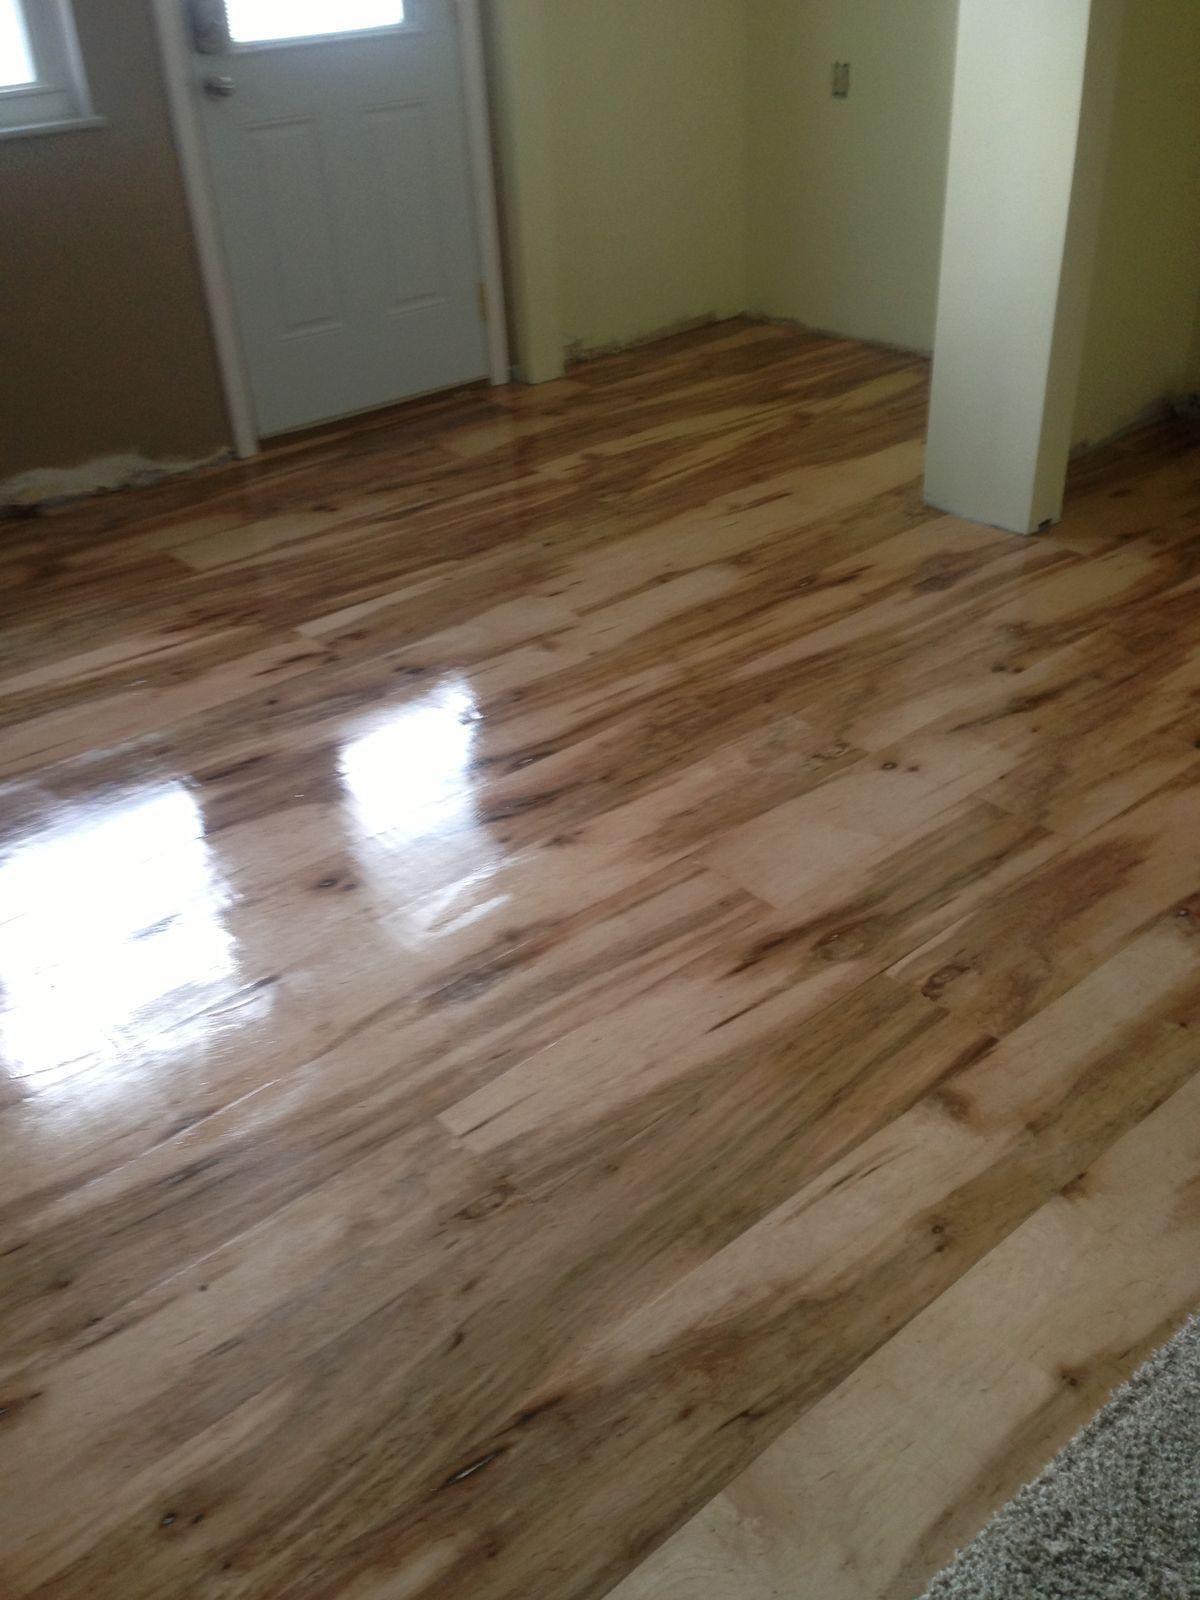 how to install hardwood flooring on plywood of plywood flooring creative diy ideas pinterest plywood within plywood flooring